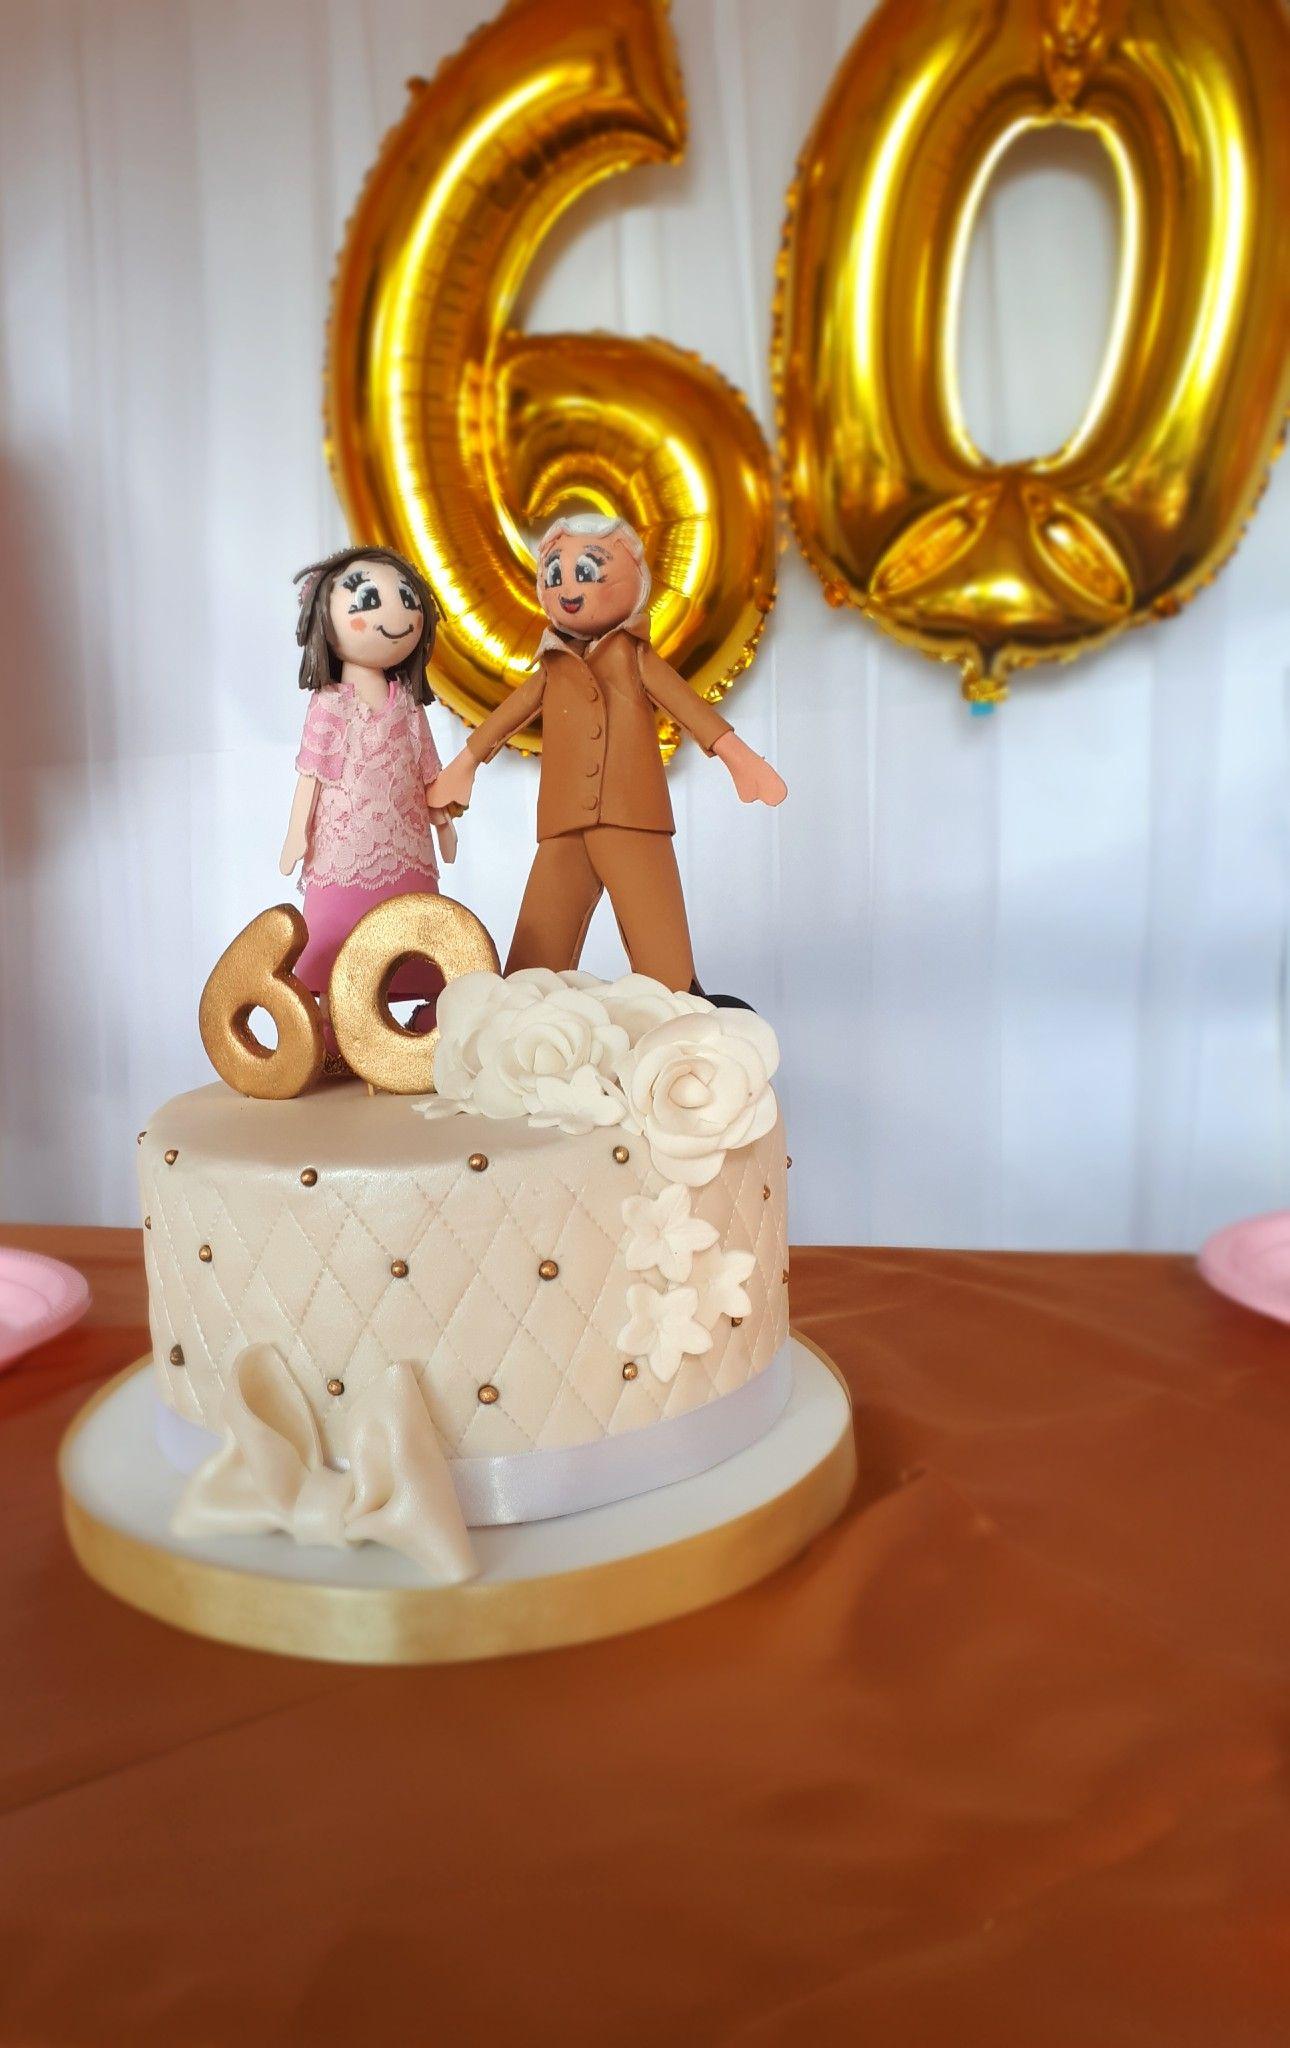 Diamond Wedding Cake Pastel De Bodas De Diamante 60 Años De Casados Cake Desserts Birthday Cake